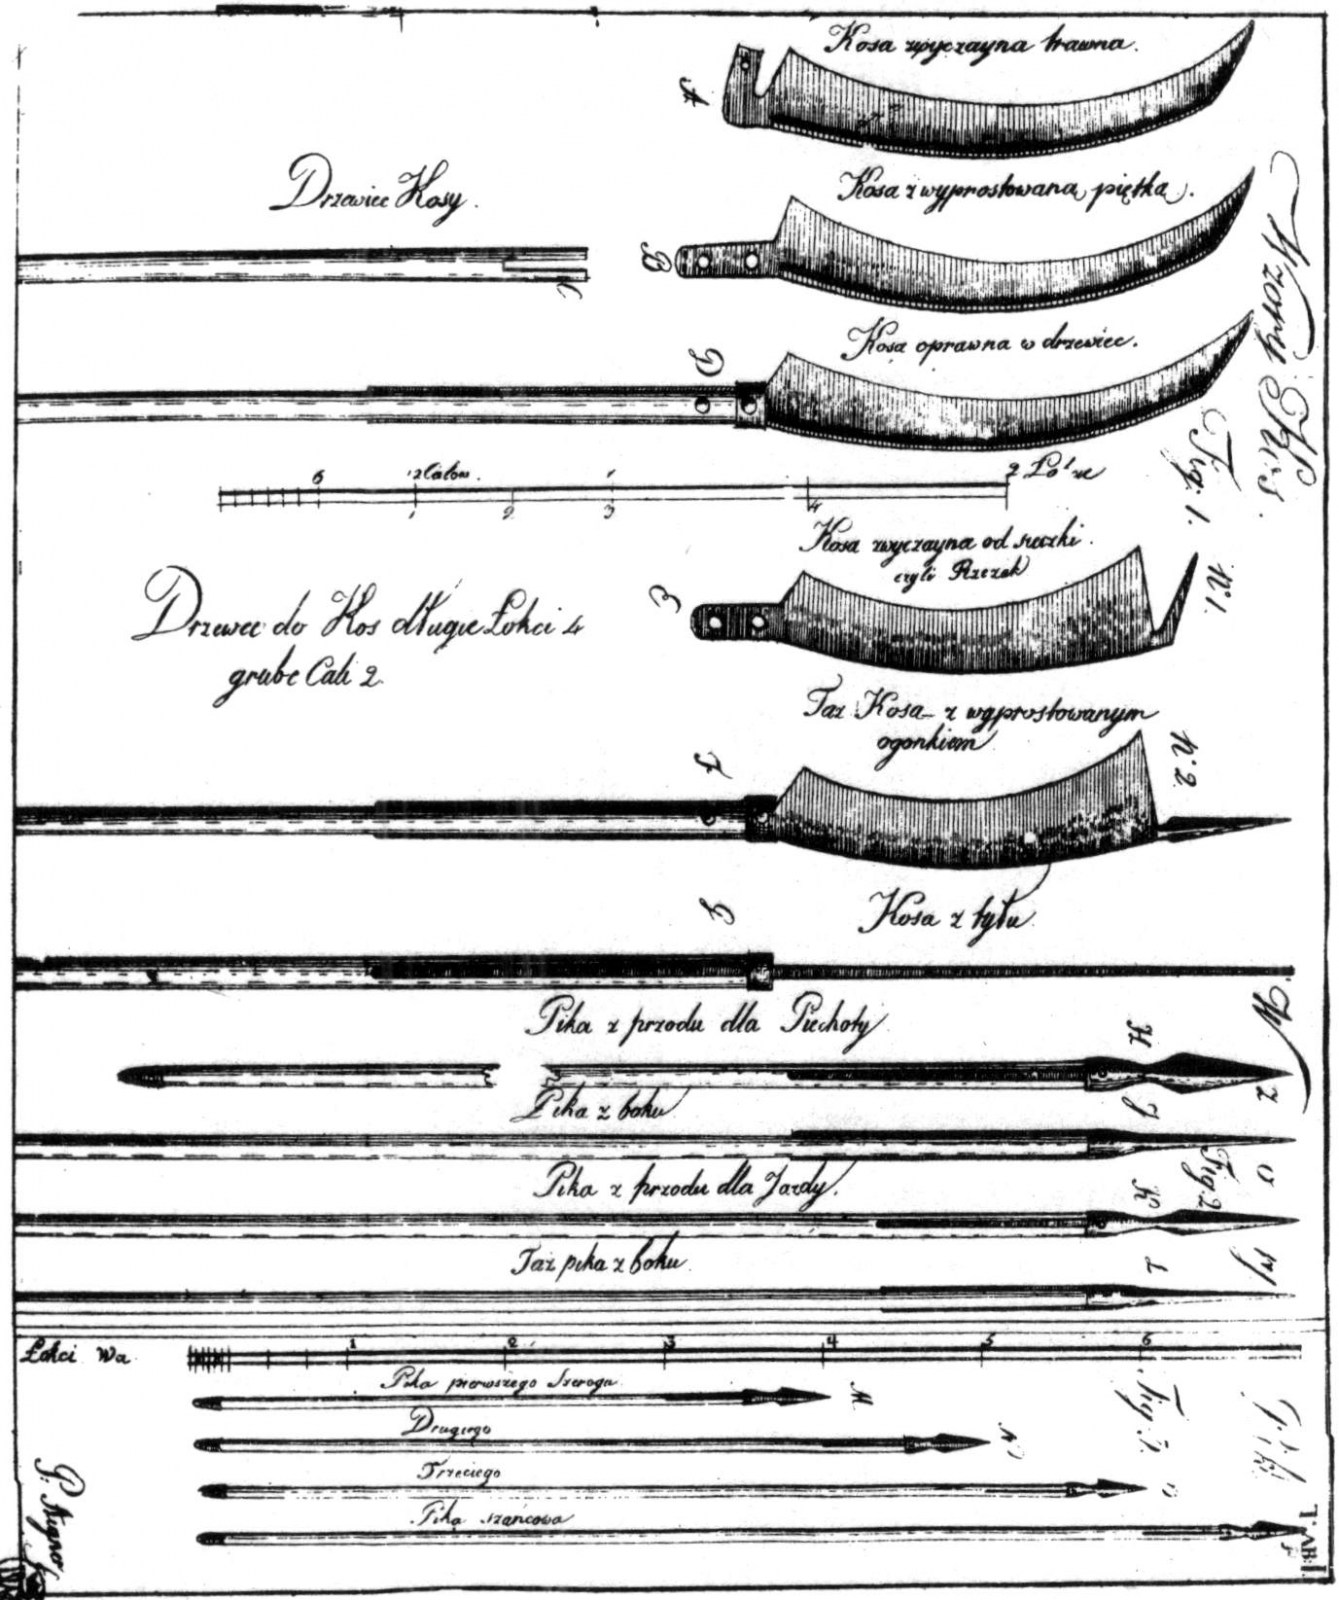 Piotr Aigner, Nauka o pikach i kosach, 1794, Source: Wikimedia